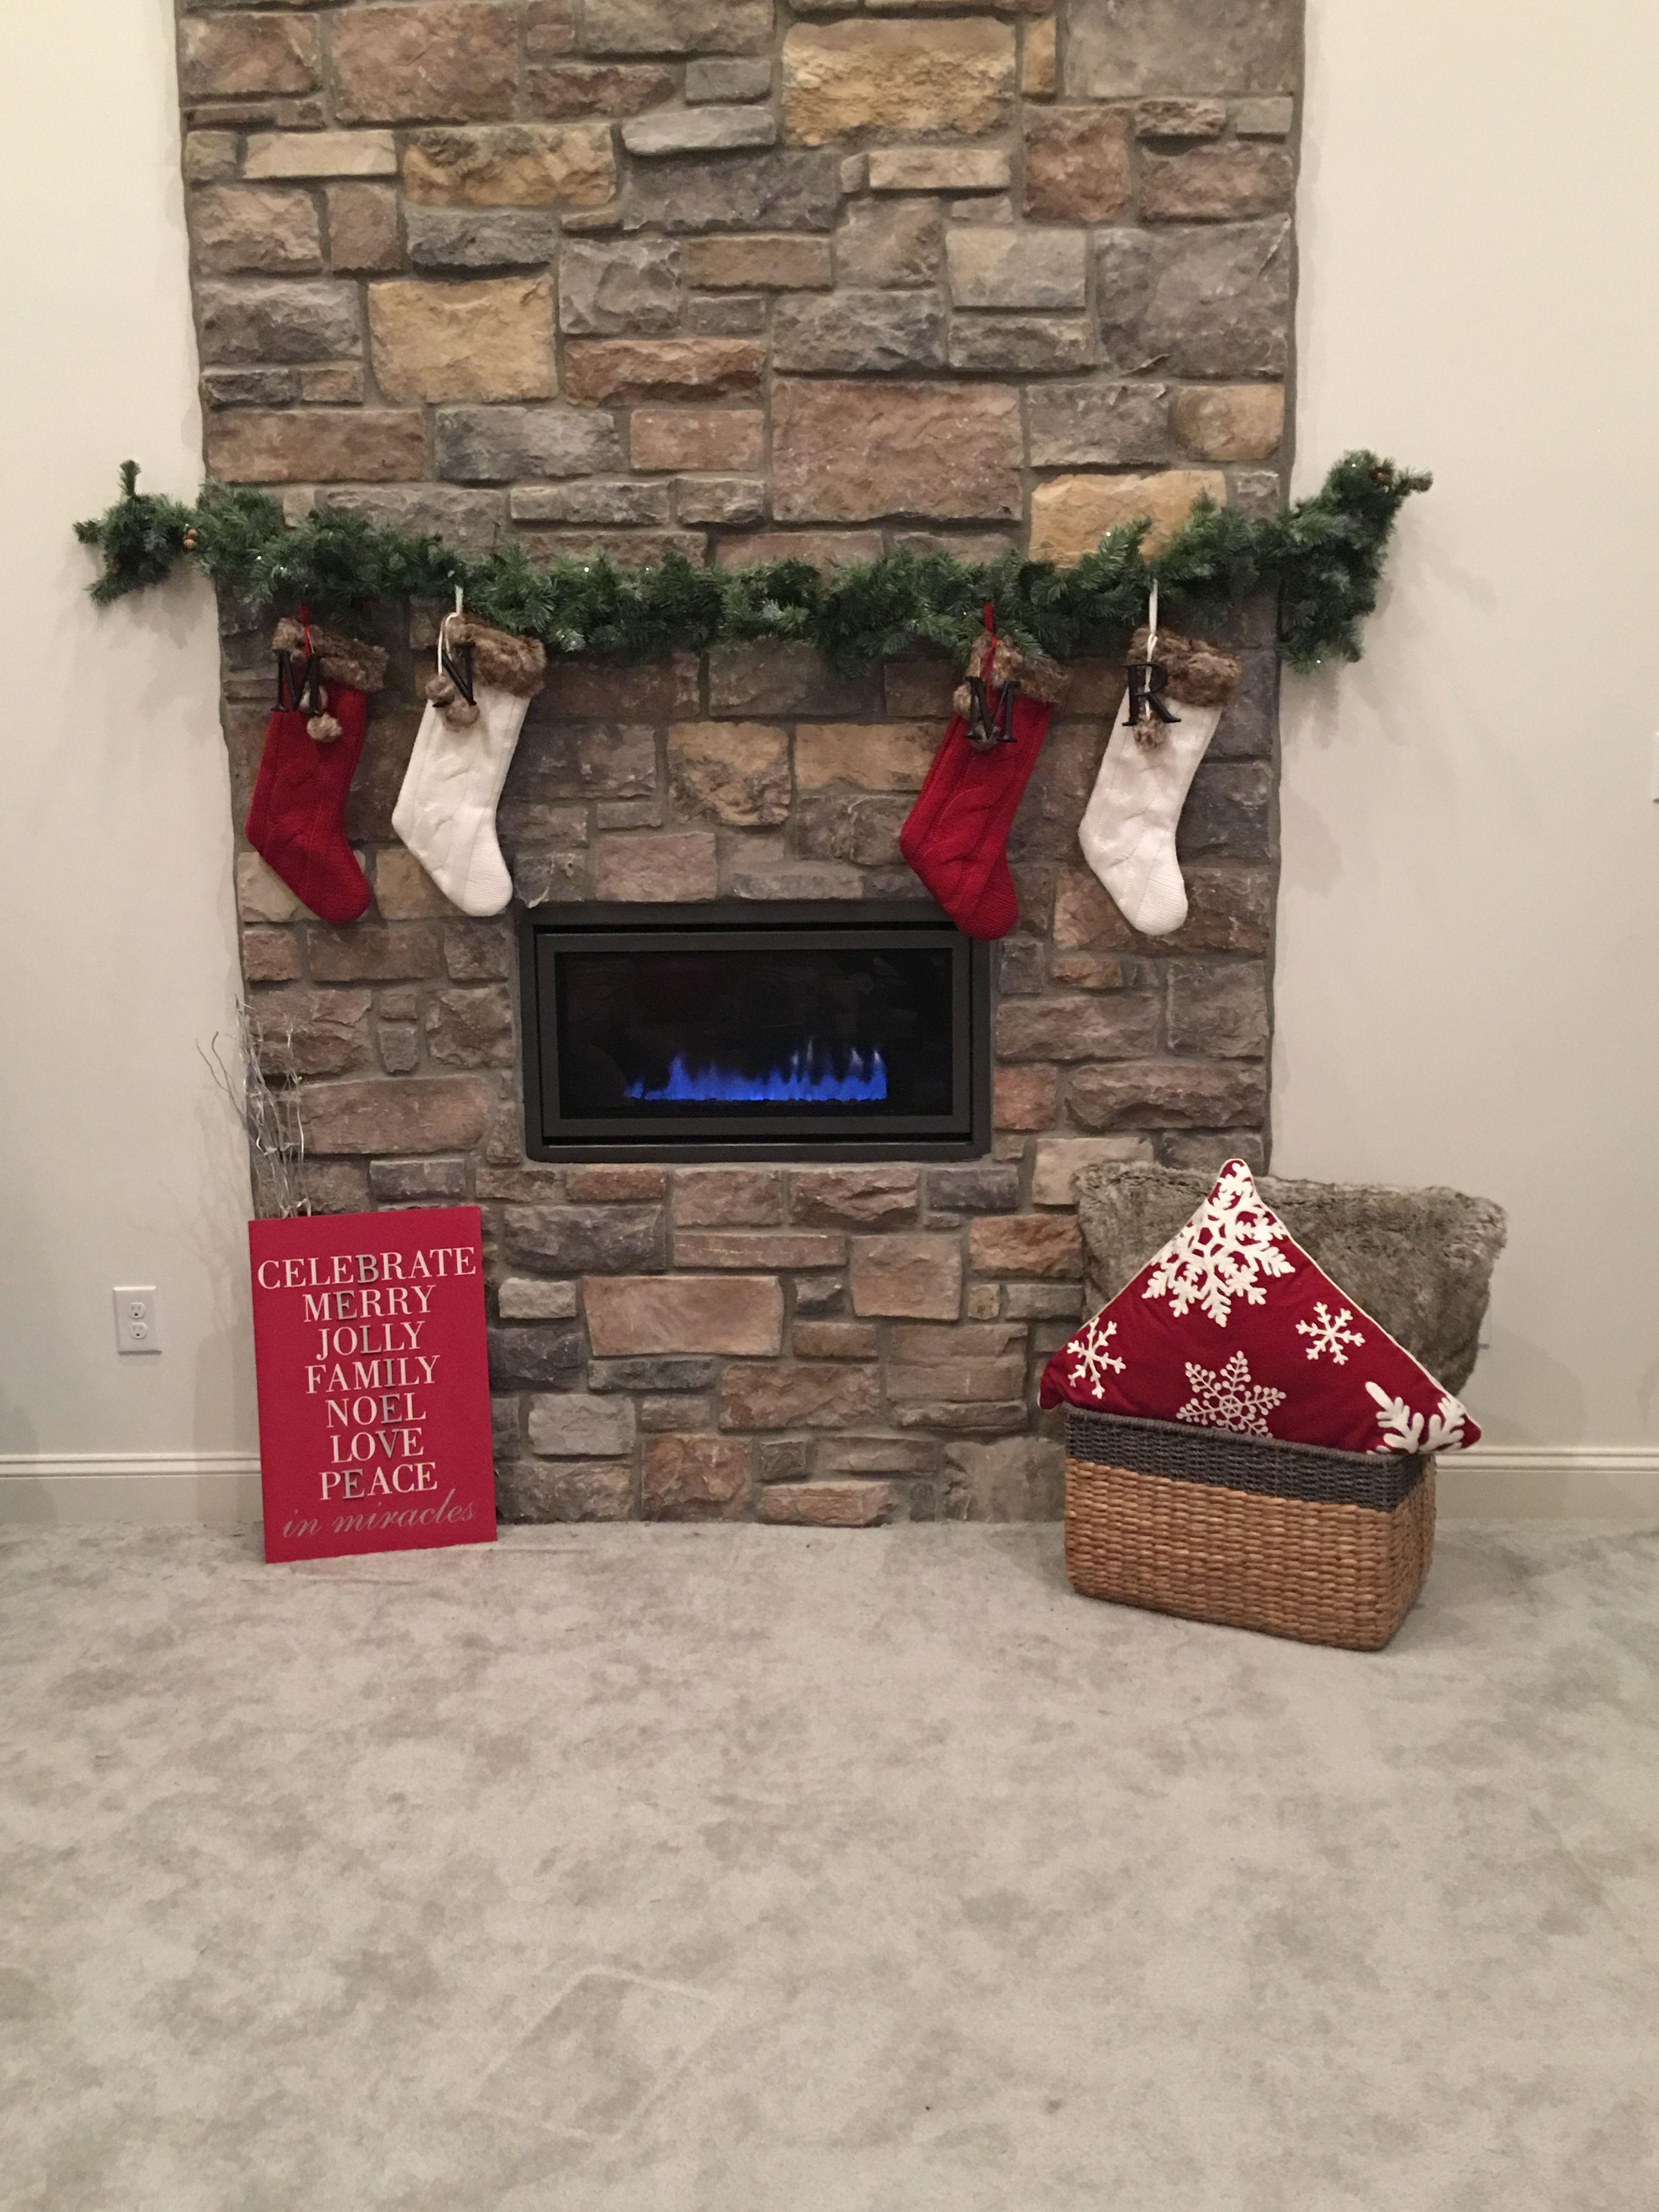 Creative Way To Hang Christmas Stockings Over A Modern Fireplace